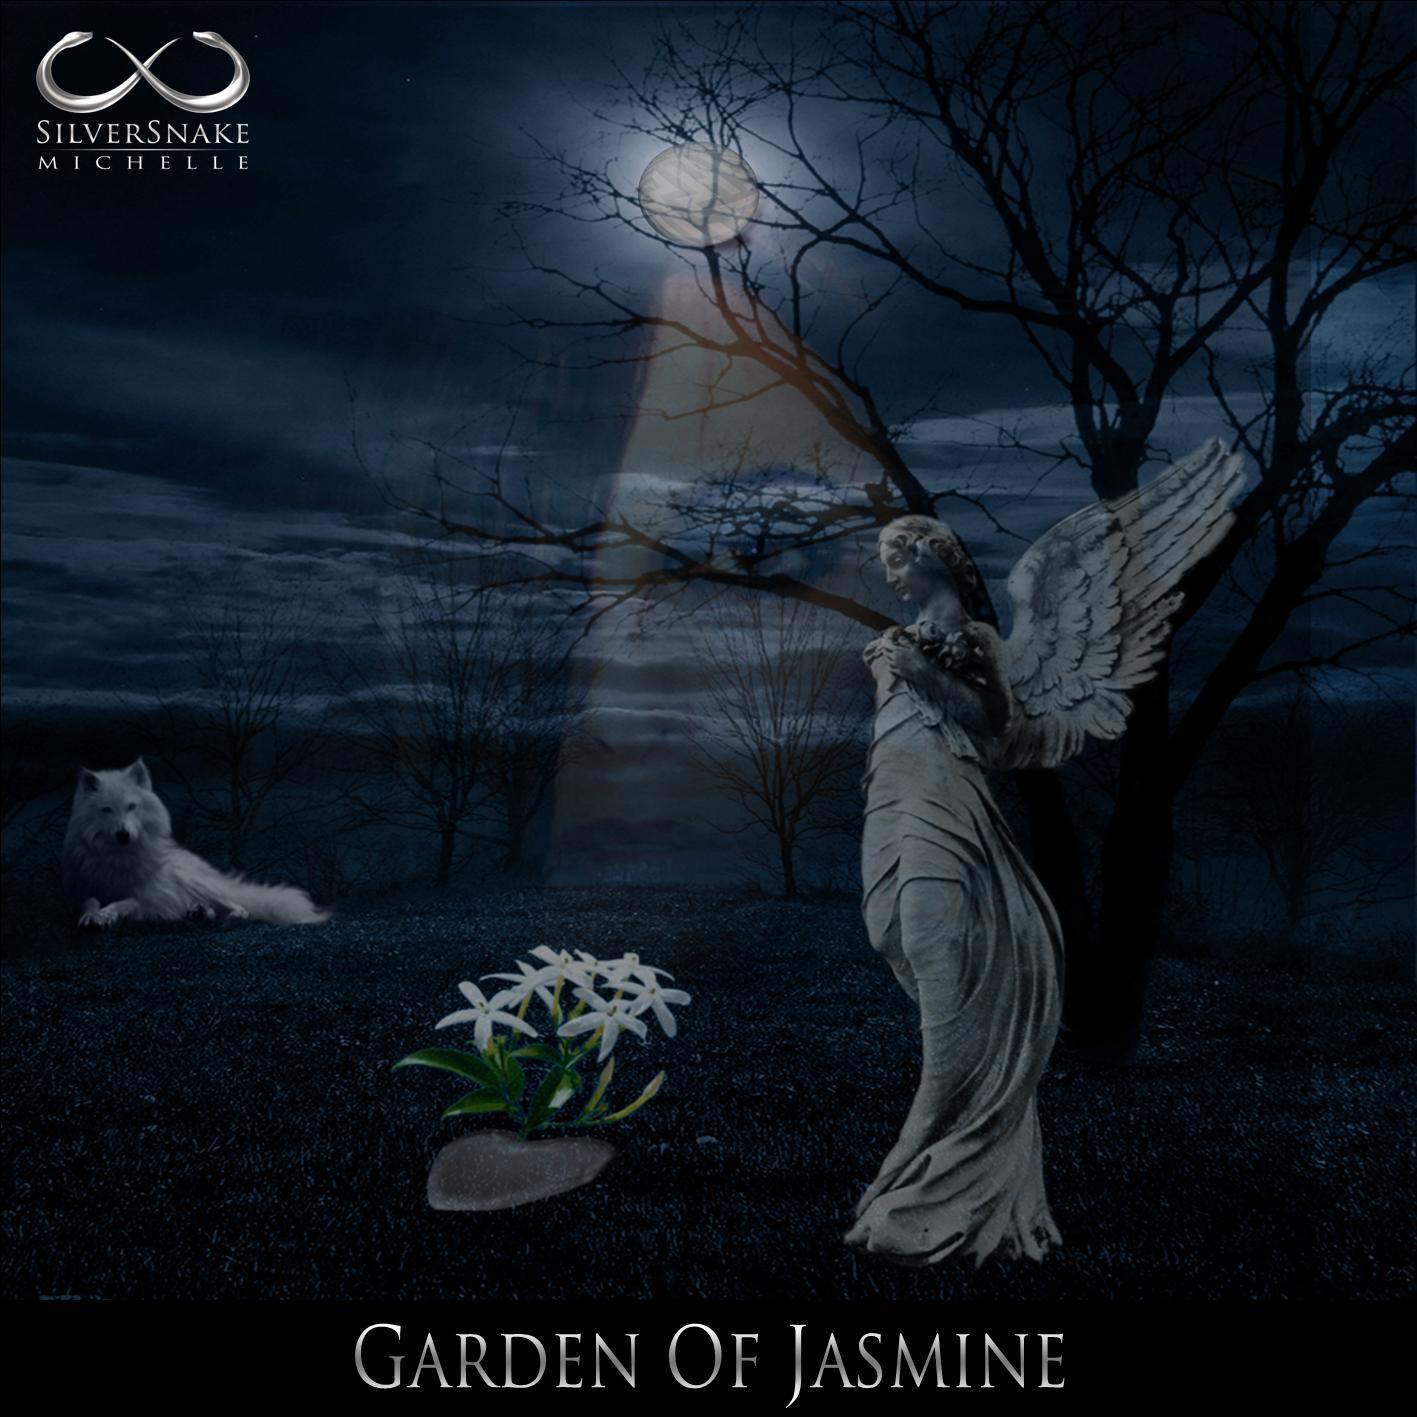 Silversnake Michelle Garden Of Jasmine